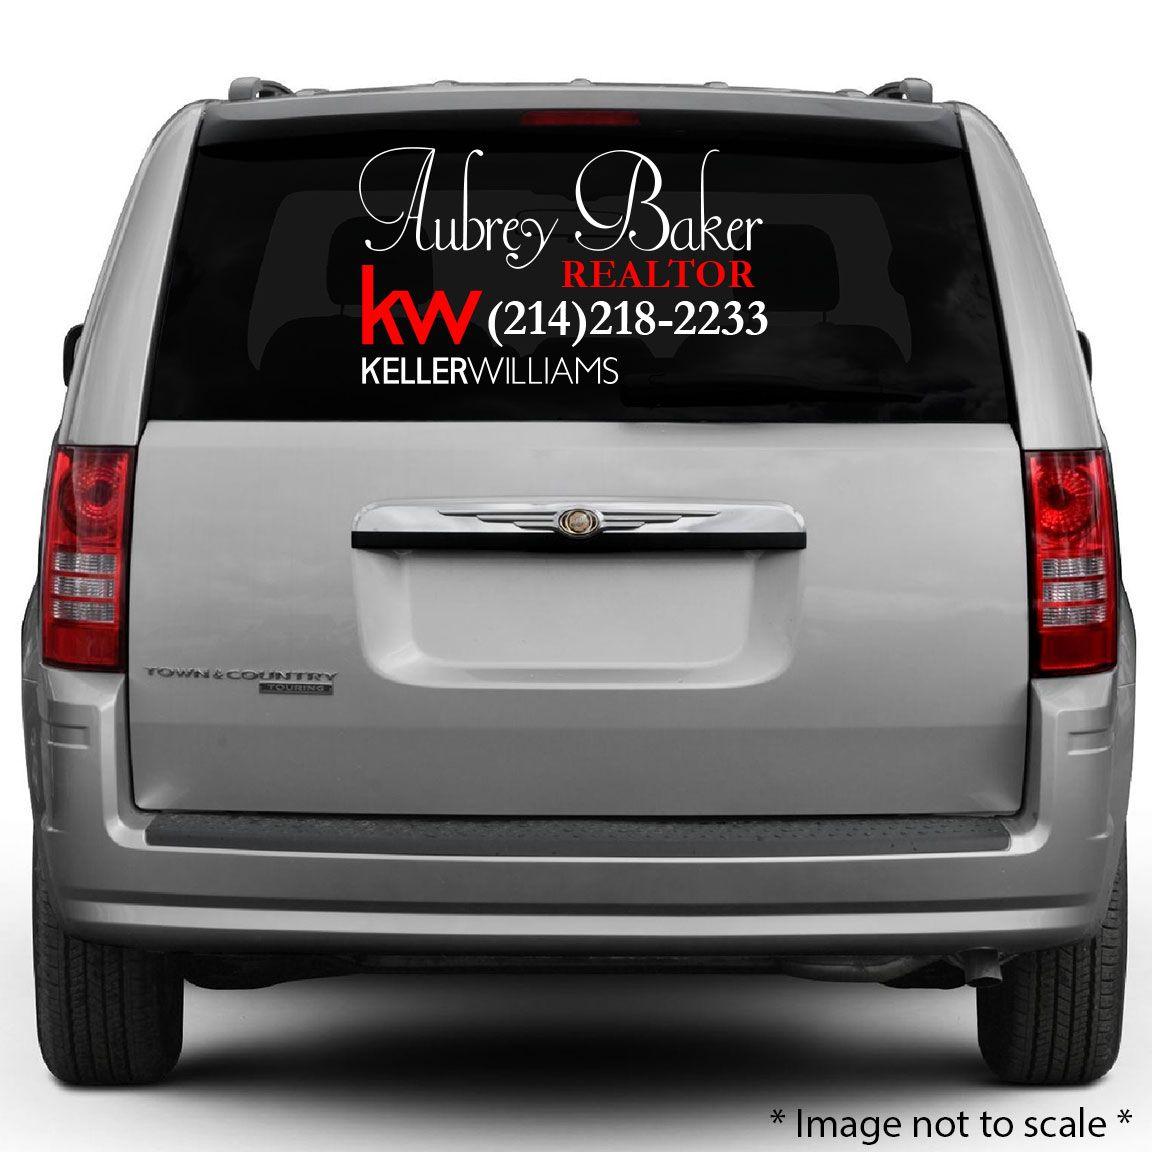 Aubrey Baker HttpsStickerTitanscom Rear - Custom car decals businesswindow decals